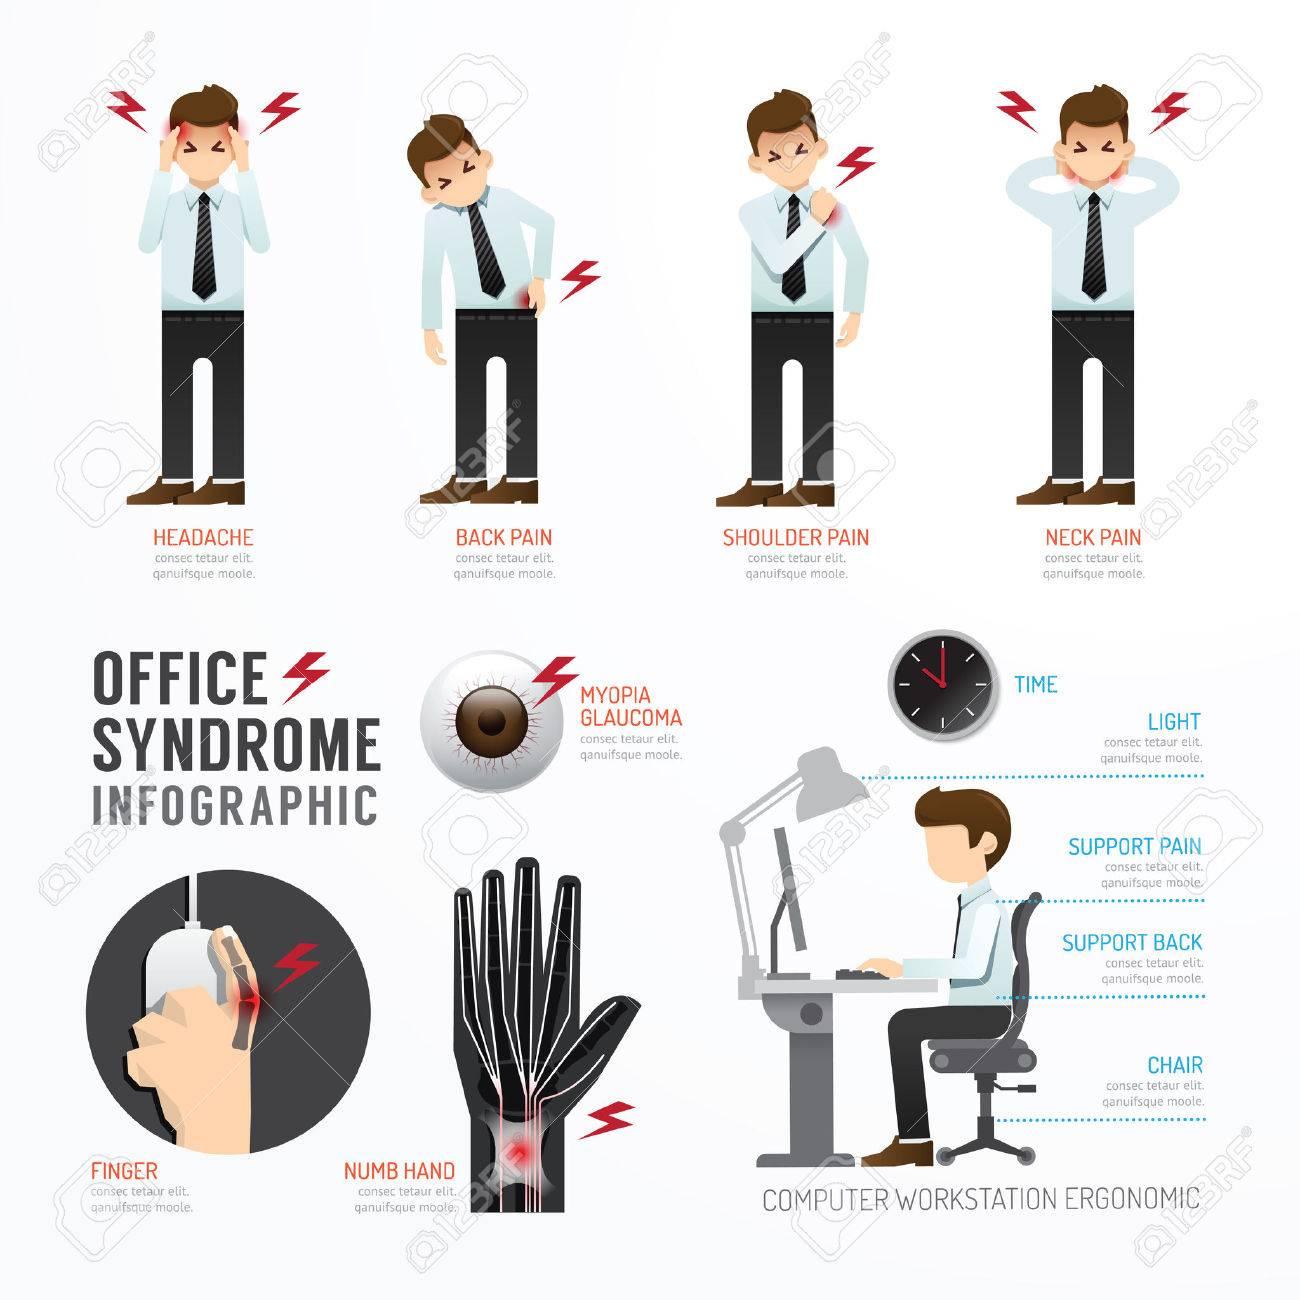 Infographic office syndrome Template Design . Concept Vector illustration Standard-Bild - 38153348